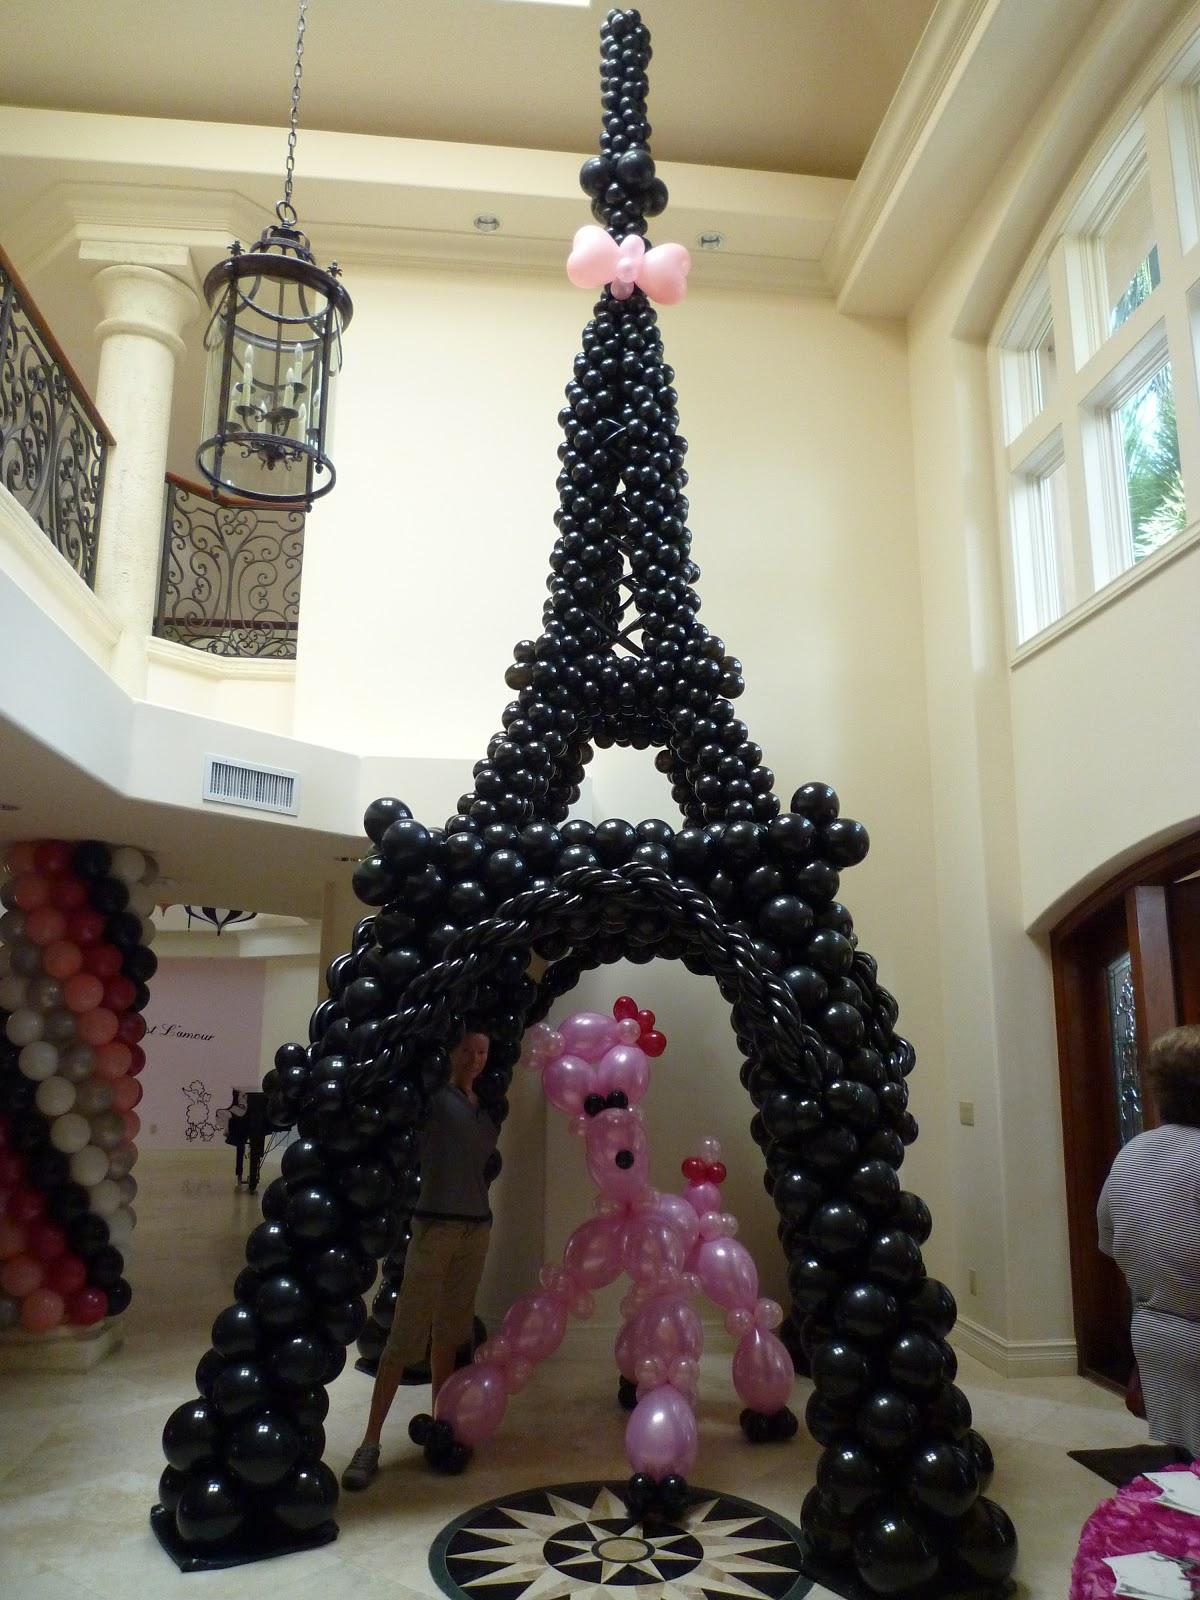 Eiffel tower birthday party decorations ideas interior for Eiffel tower decorations for the home